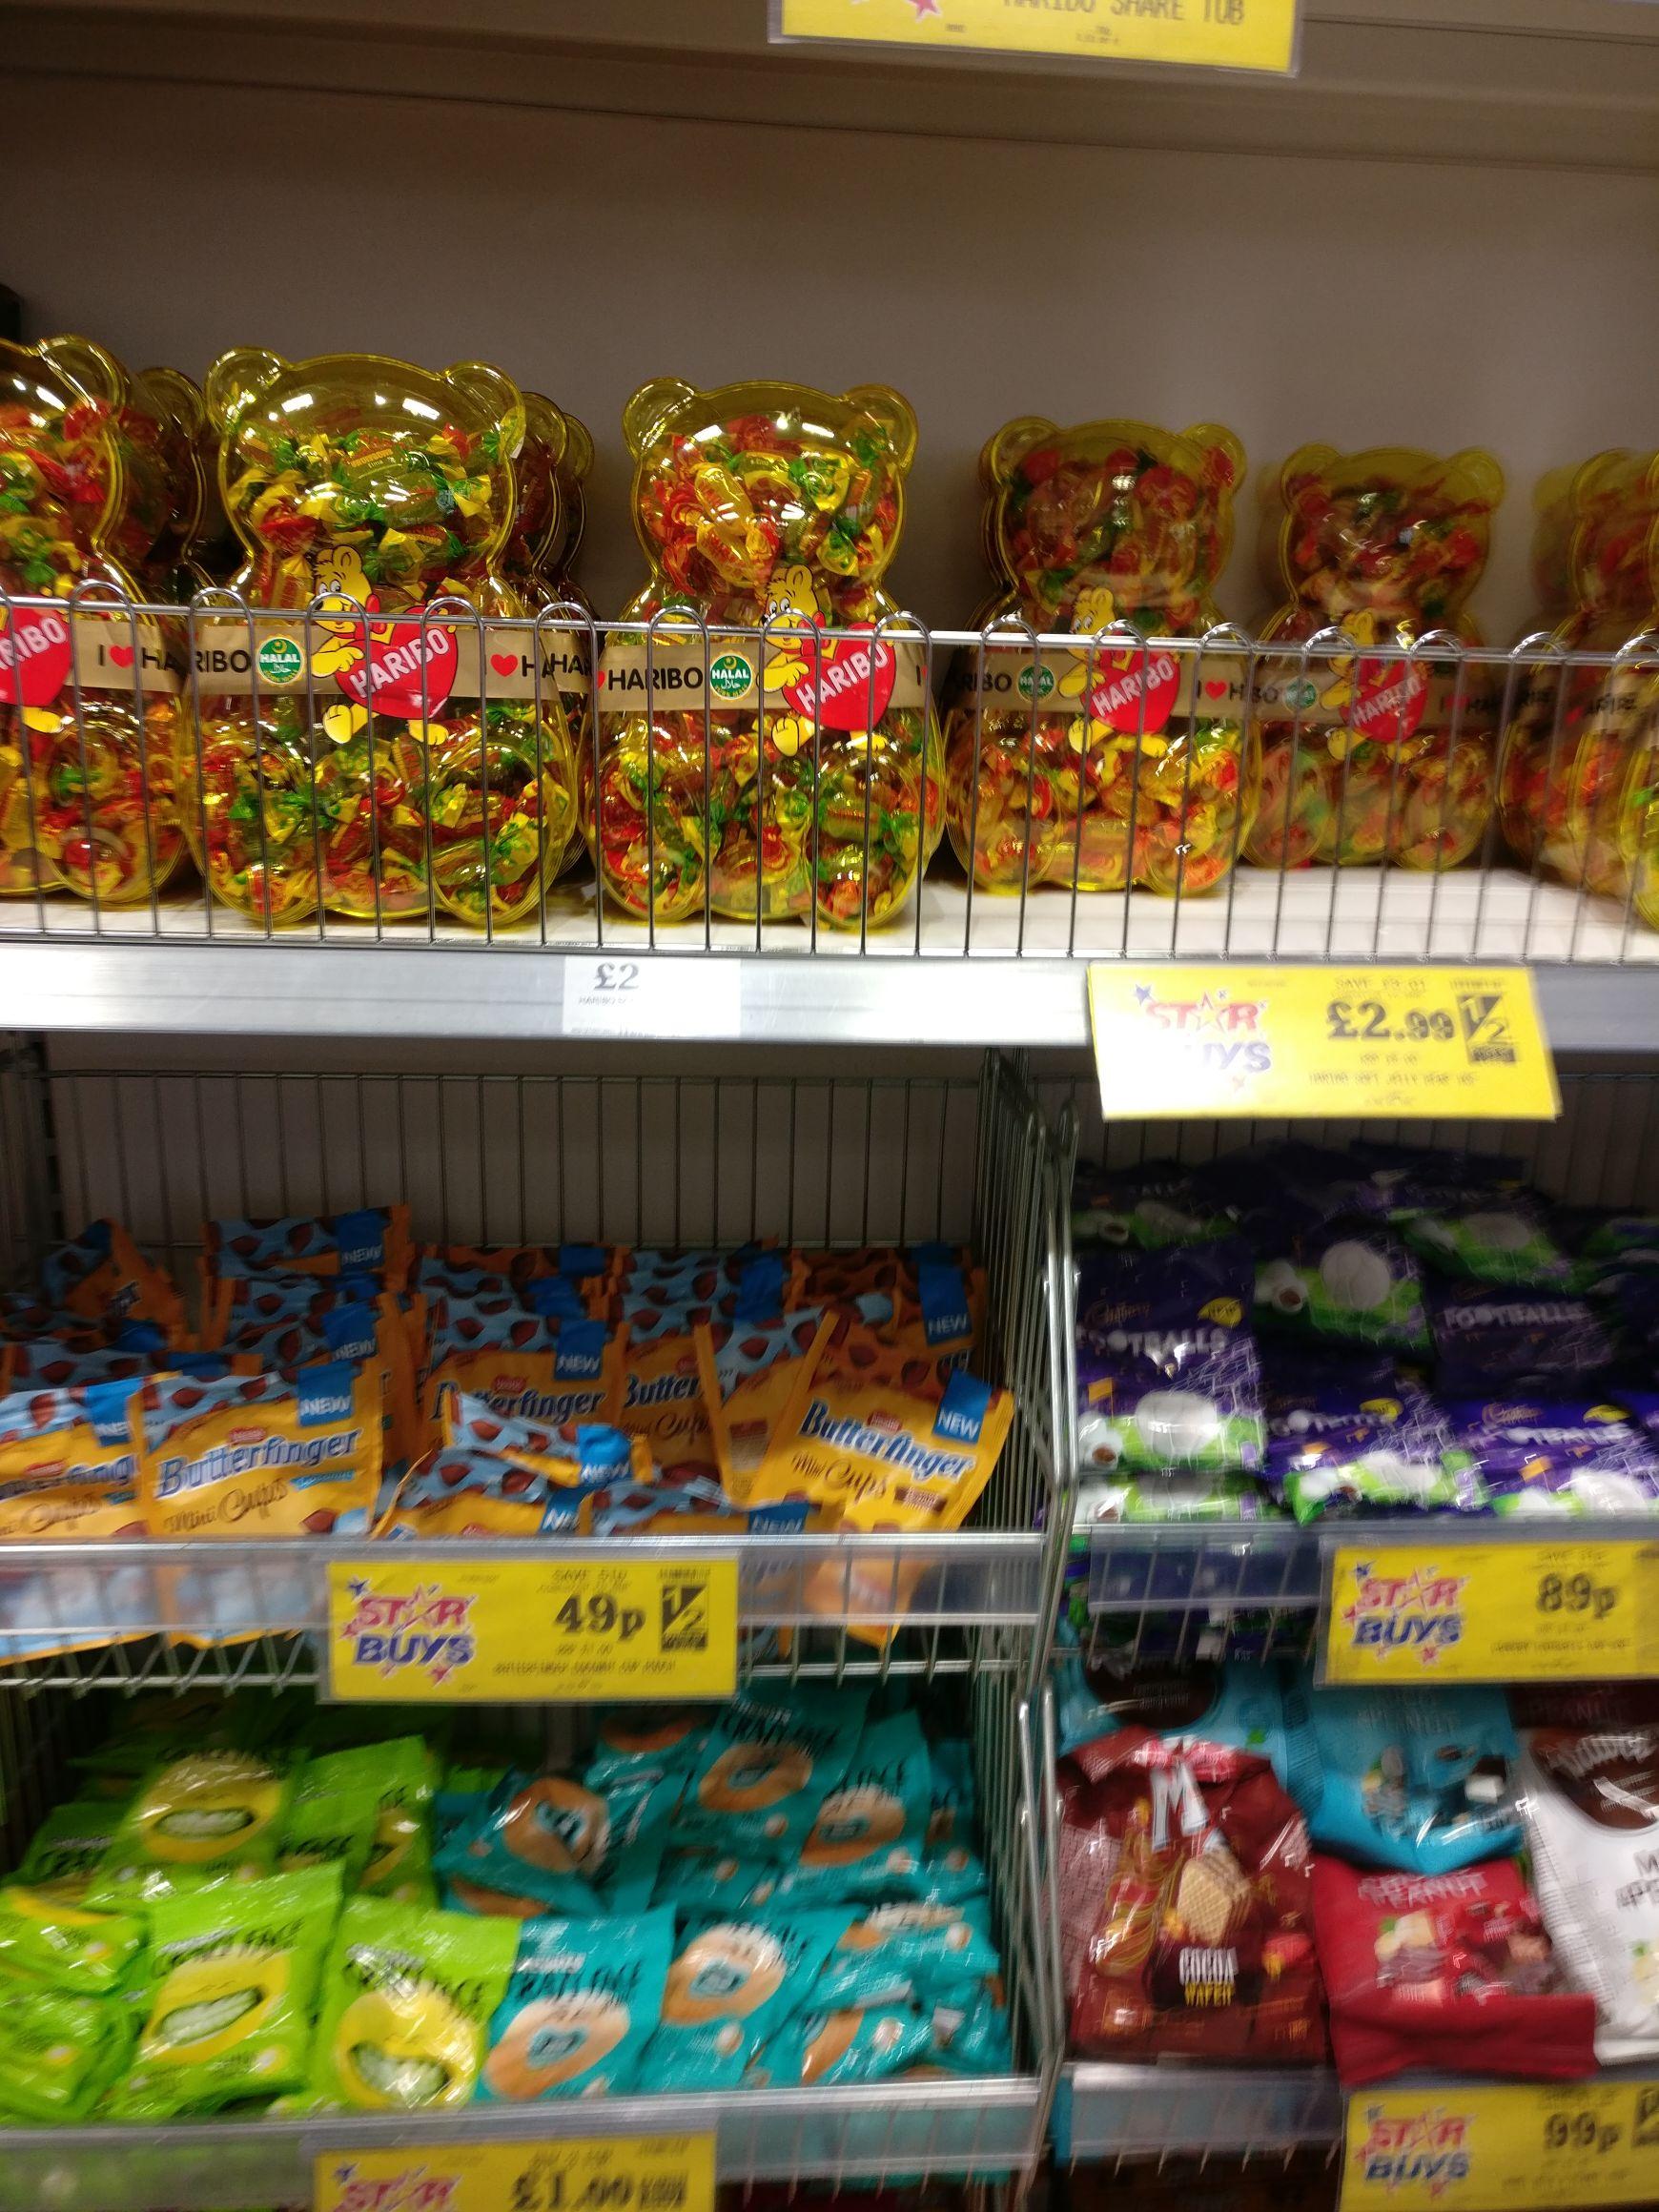 I Love Haribo Vegetarian-Friendly (also suitable for Halal) 1000g - £2.99 instore @ Home Bargains